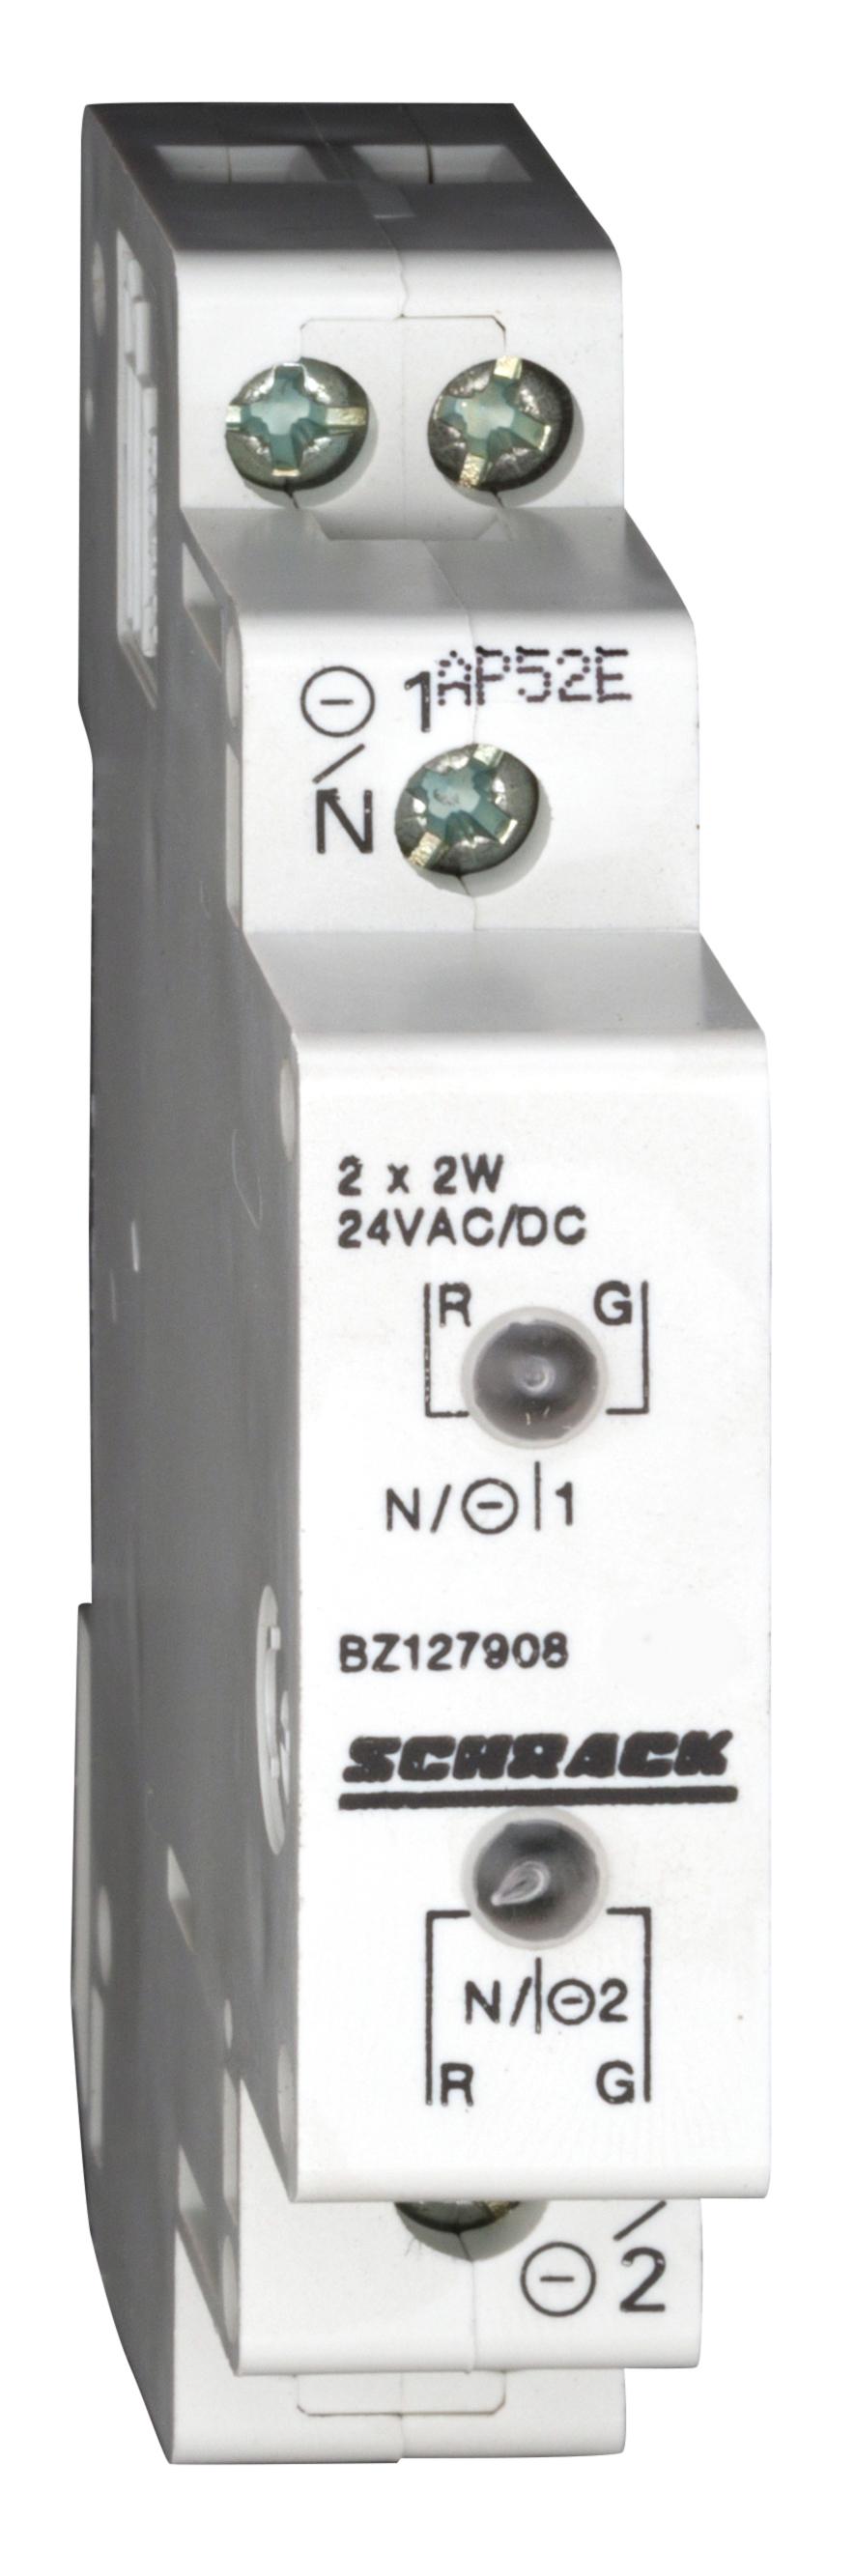 1 Stk Reiheneinbau-Doppelleuchte LED 12-24VAC/DC, rot/grün BZ127908--